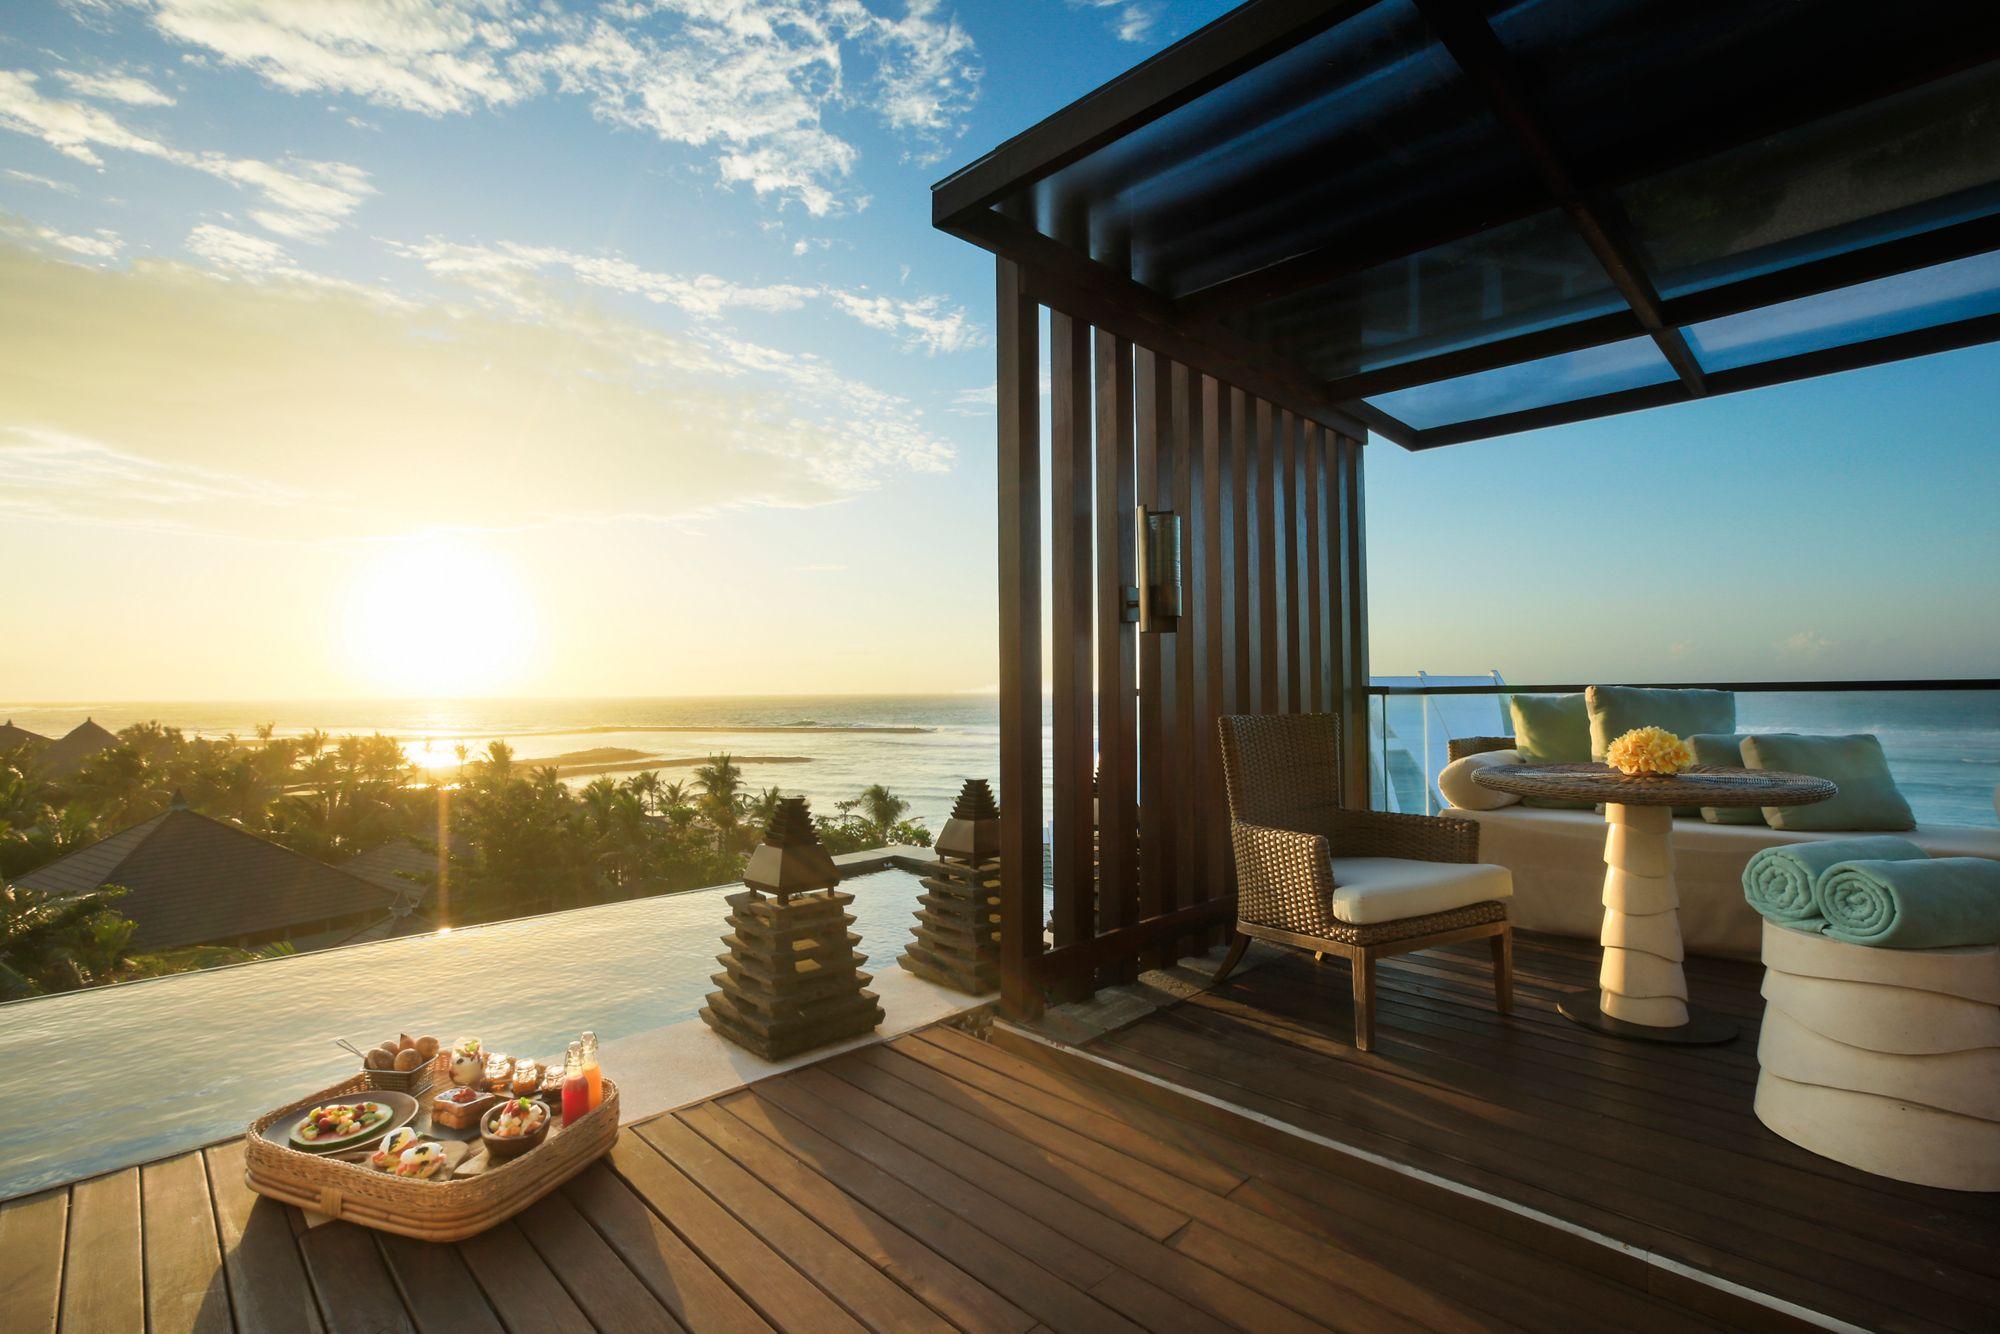 Bali Villas With Ocean View The Ritz Carlton Bali